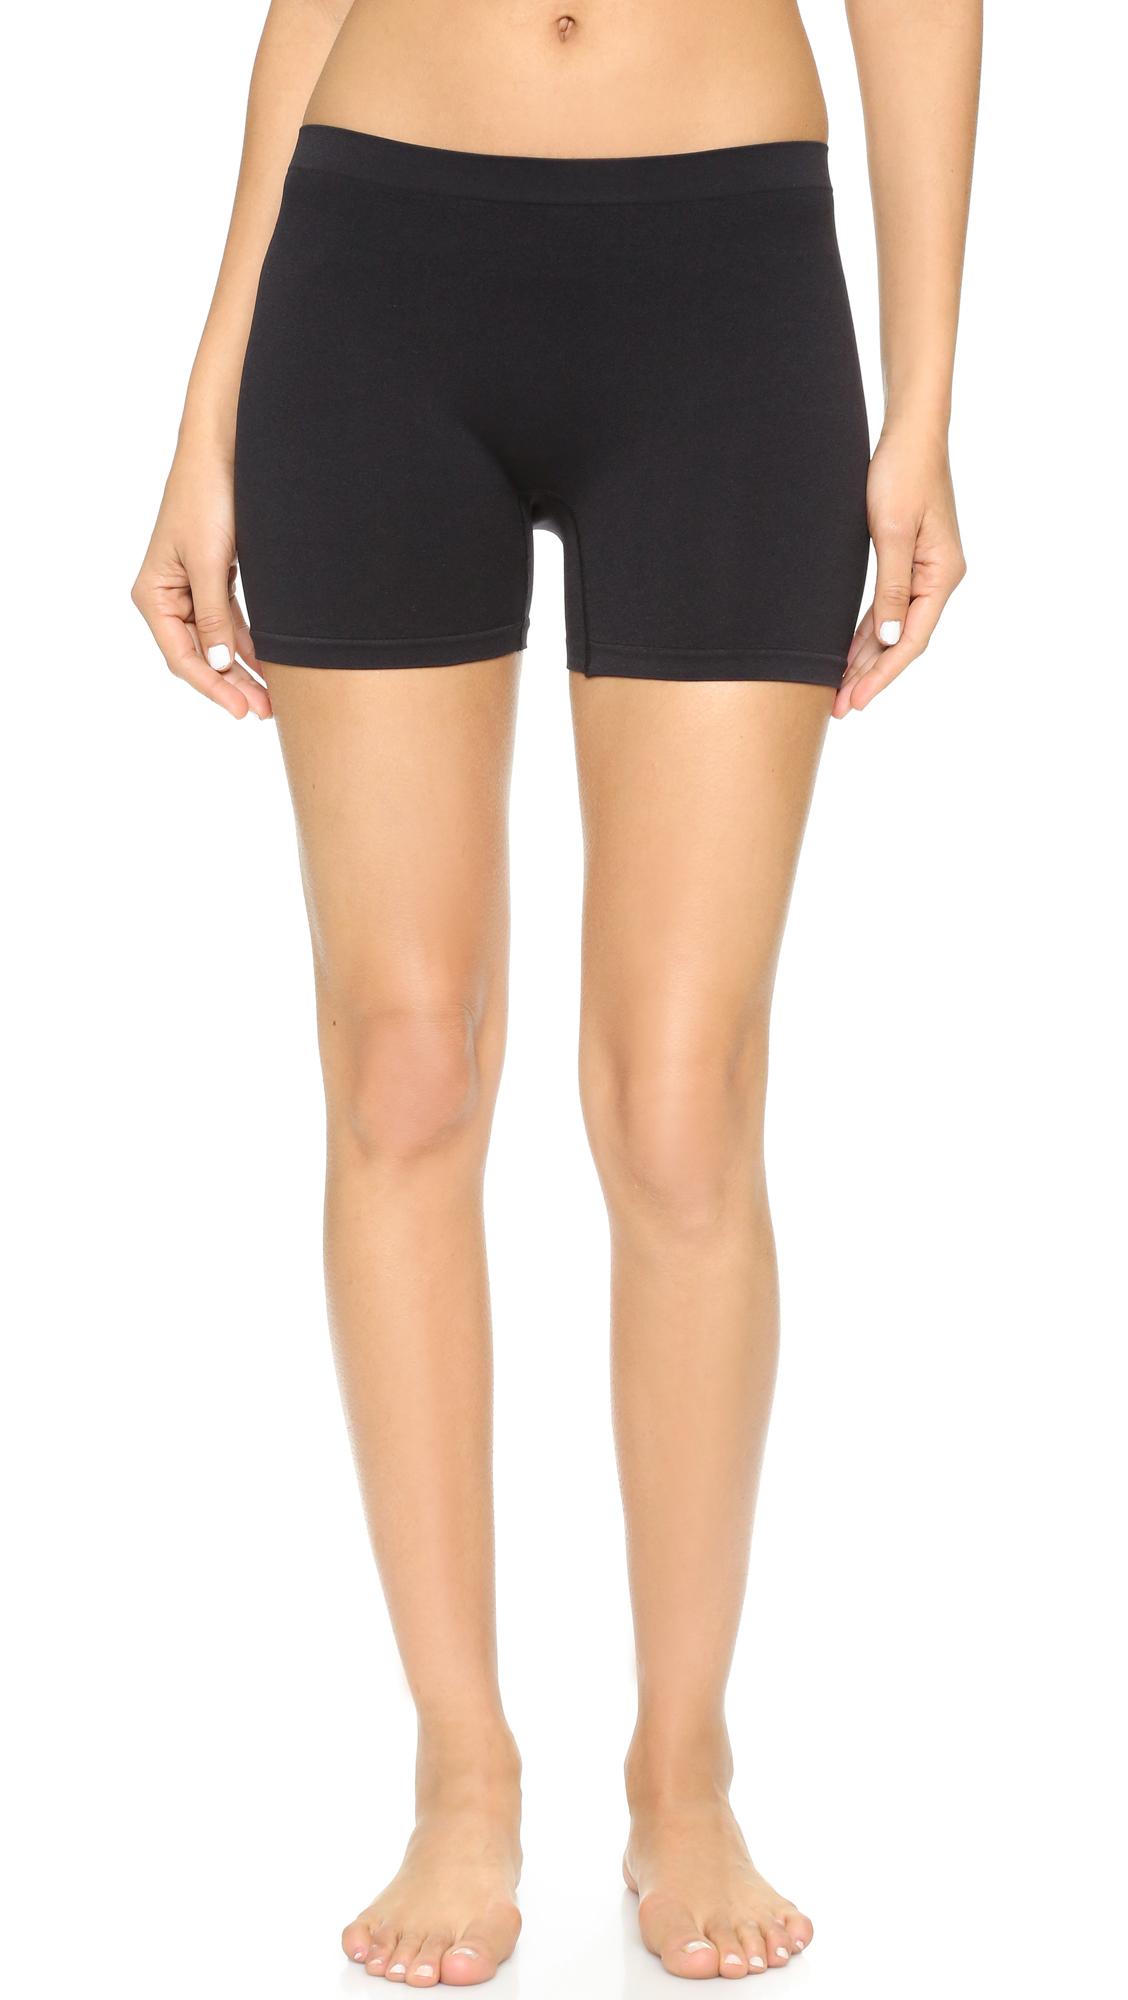 BB Dakota Caiden Seamless Bike Shorts - Black